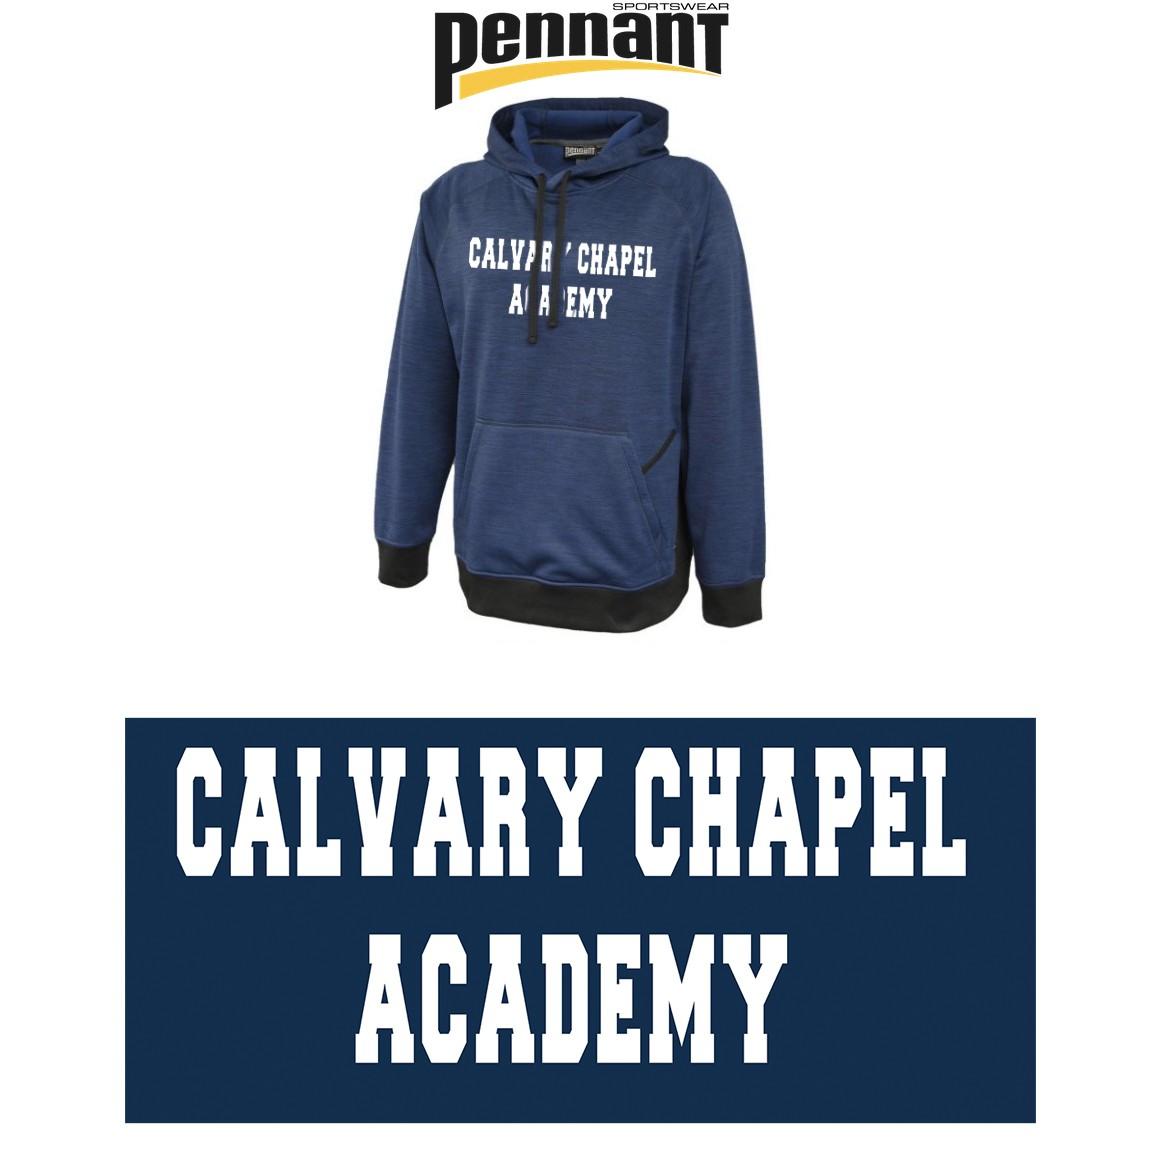 Calvary Chapel Academy Pennant Sportswear Jetstar Hoodie, Unisex Adult